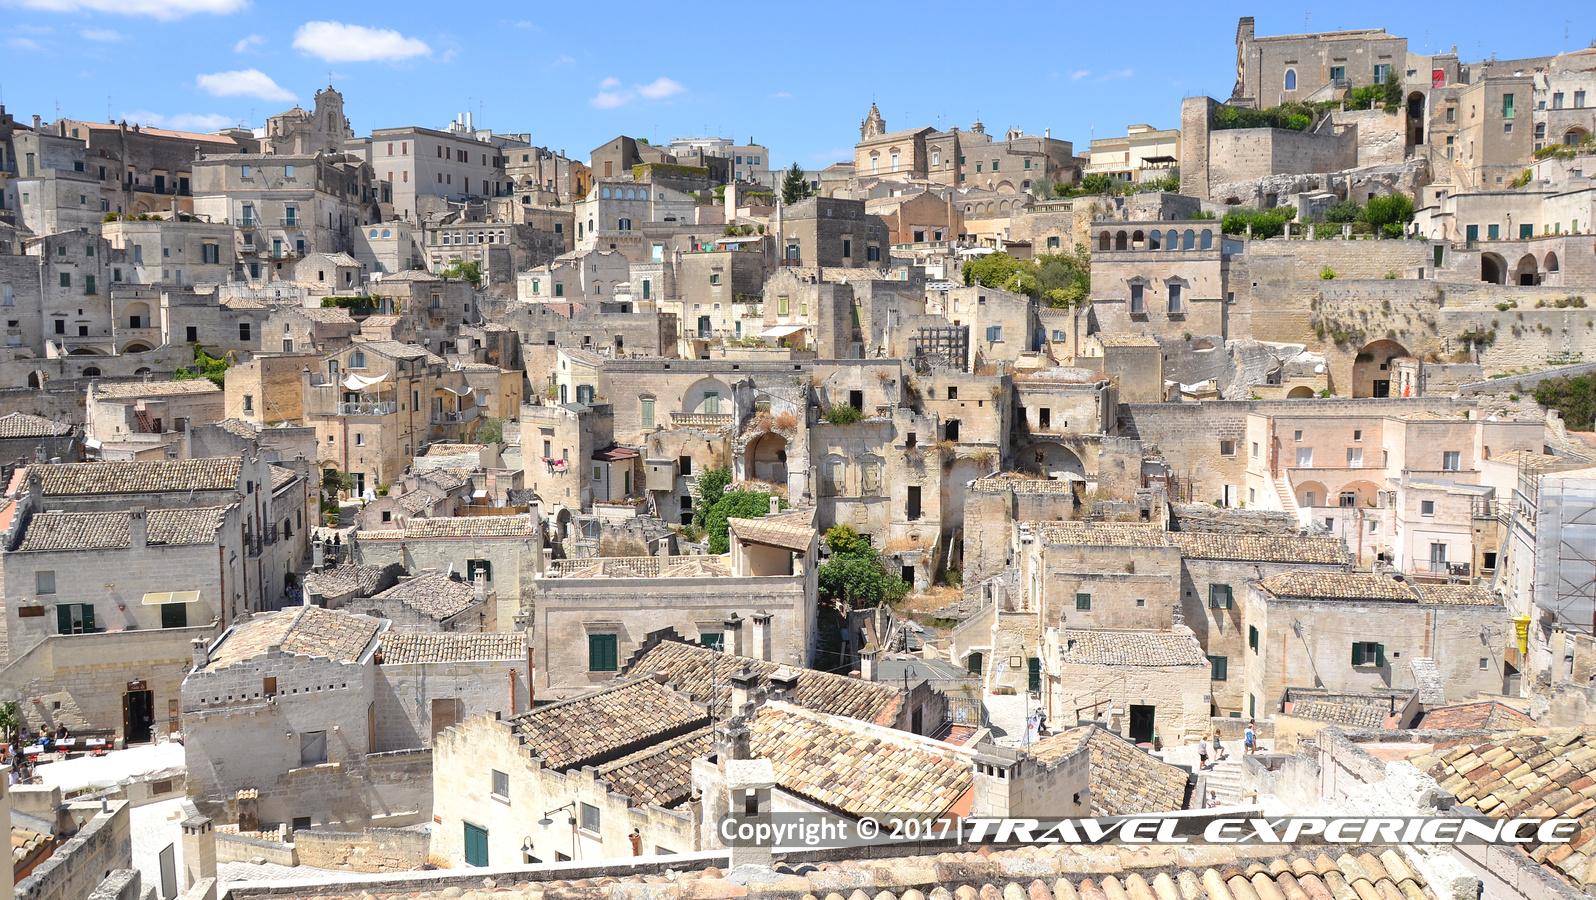 Foto panorama dei Sassi di Matera